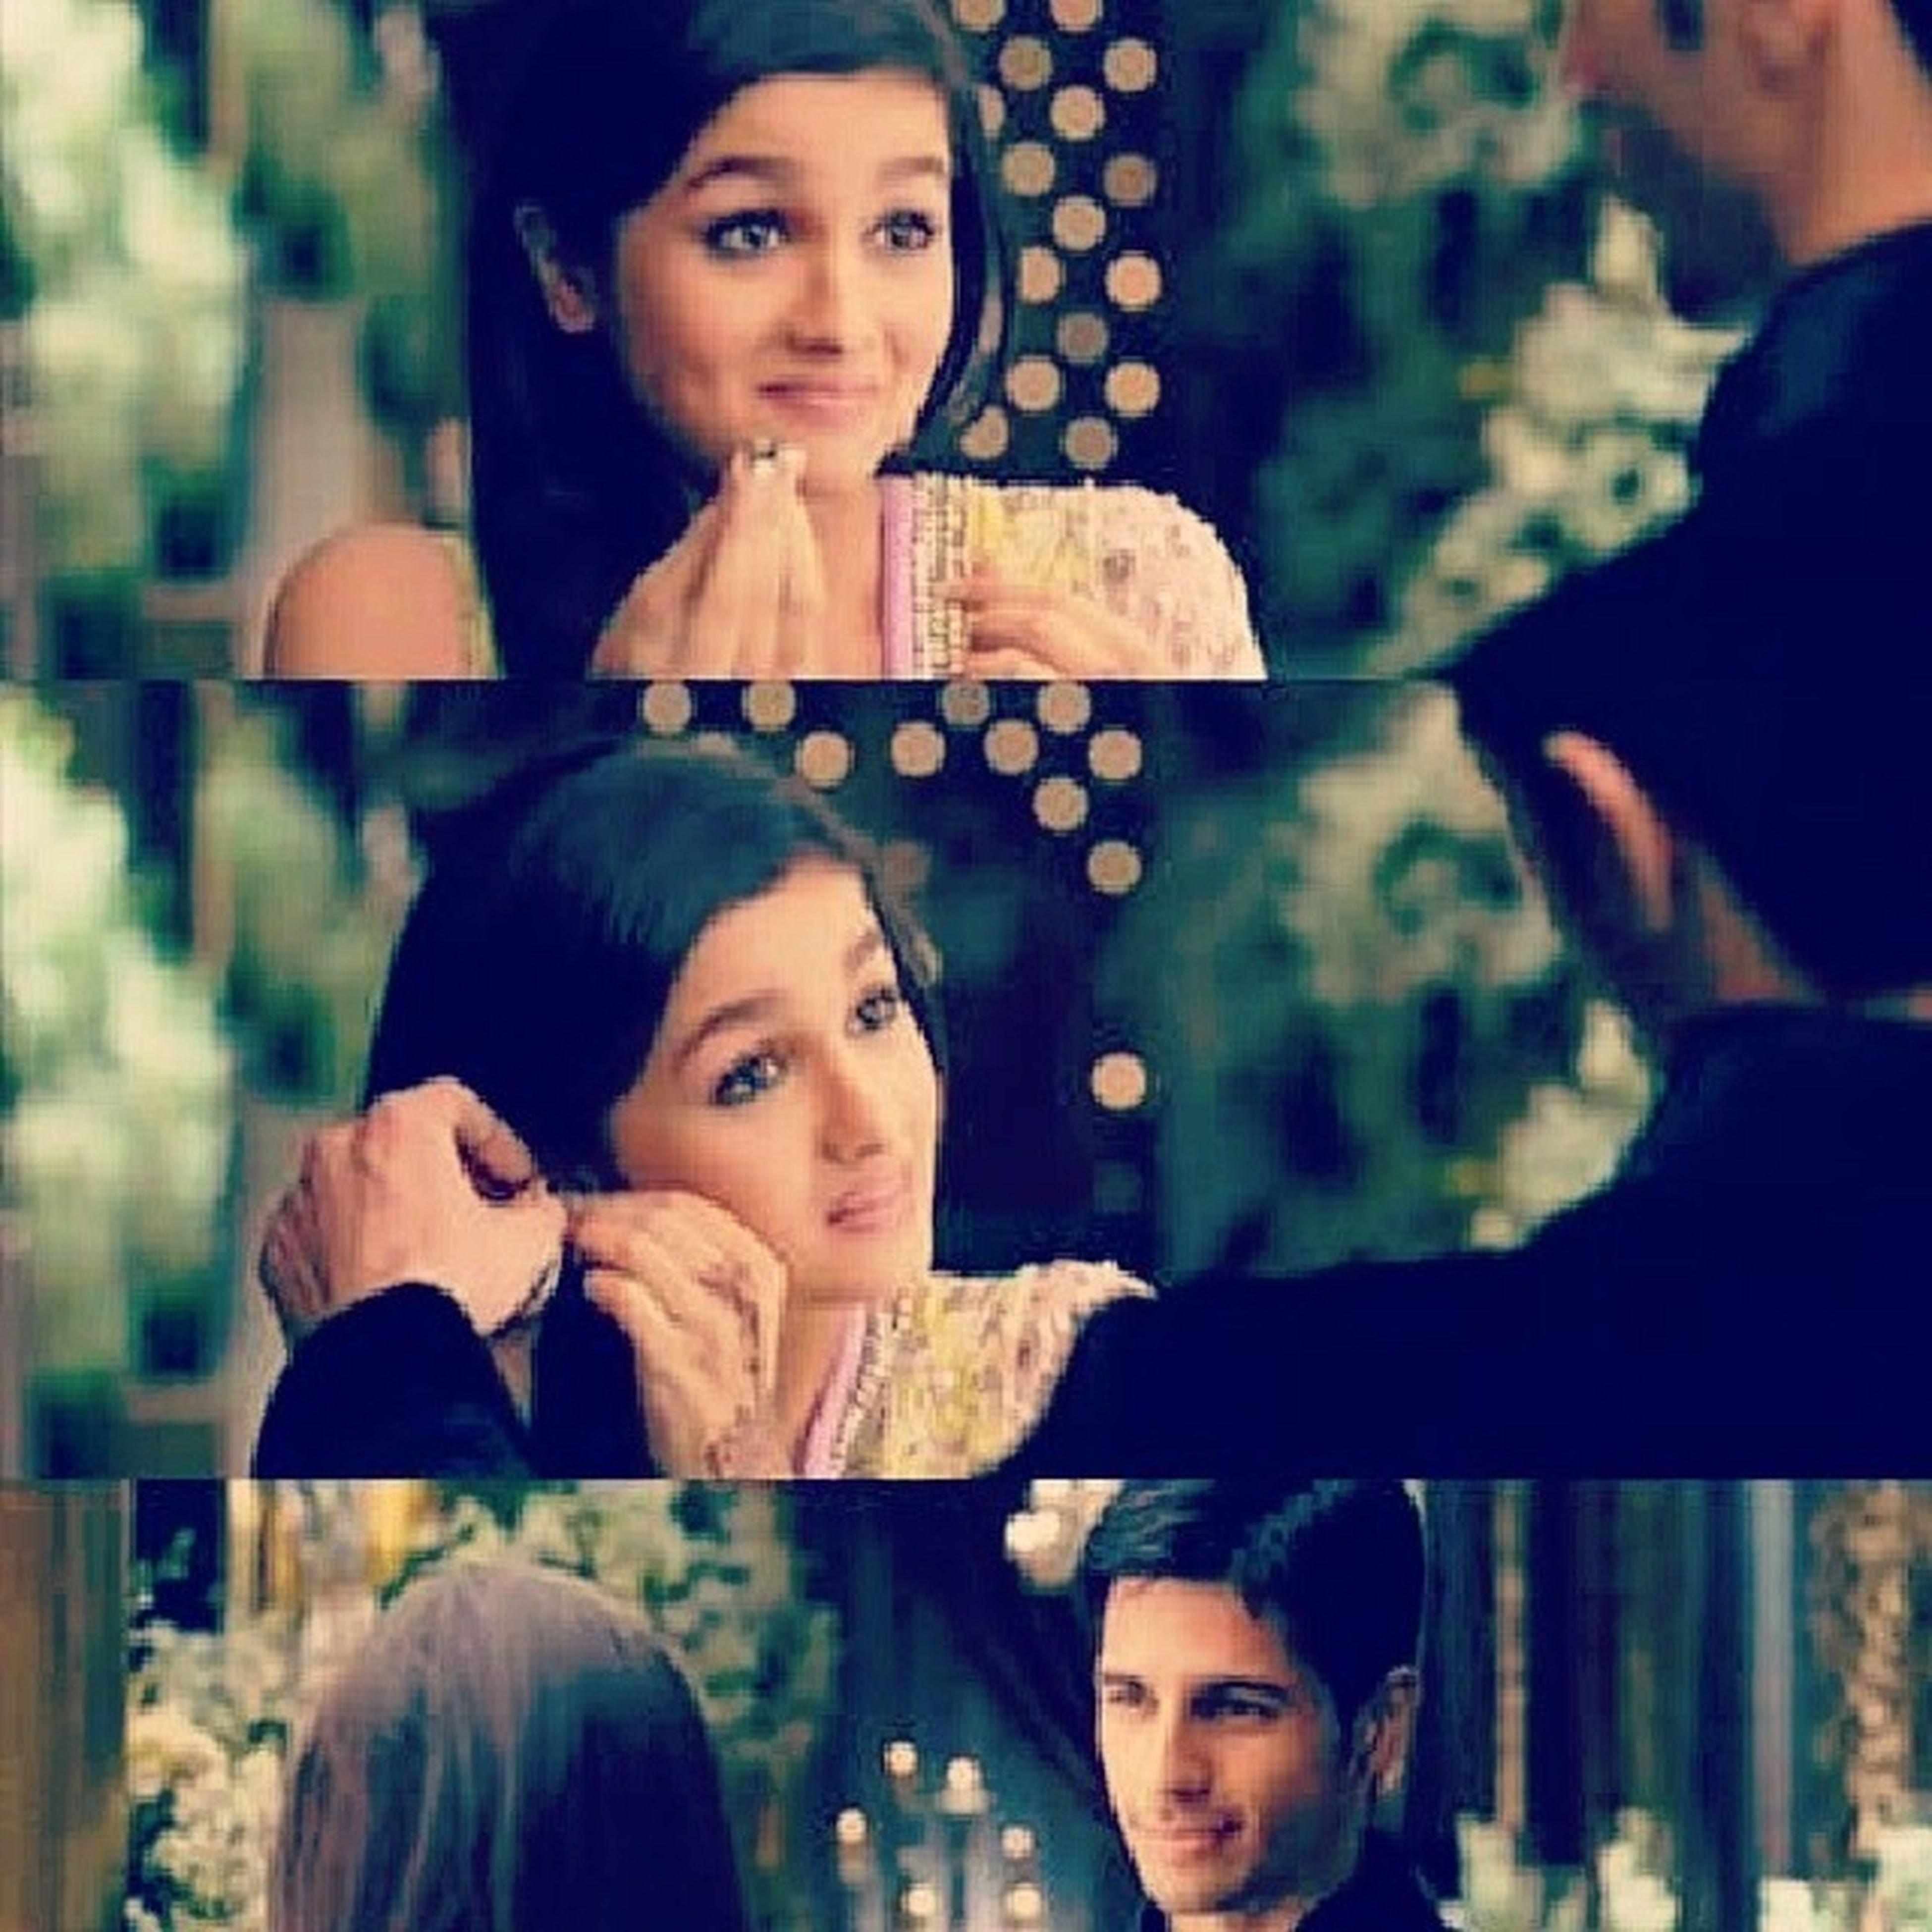 Cute Ishqwala Love Alia Siddarth 😚